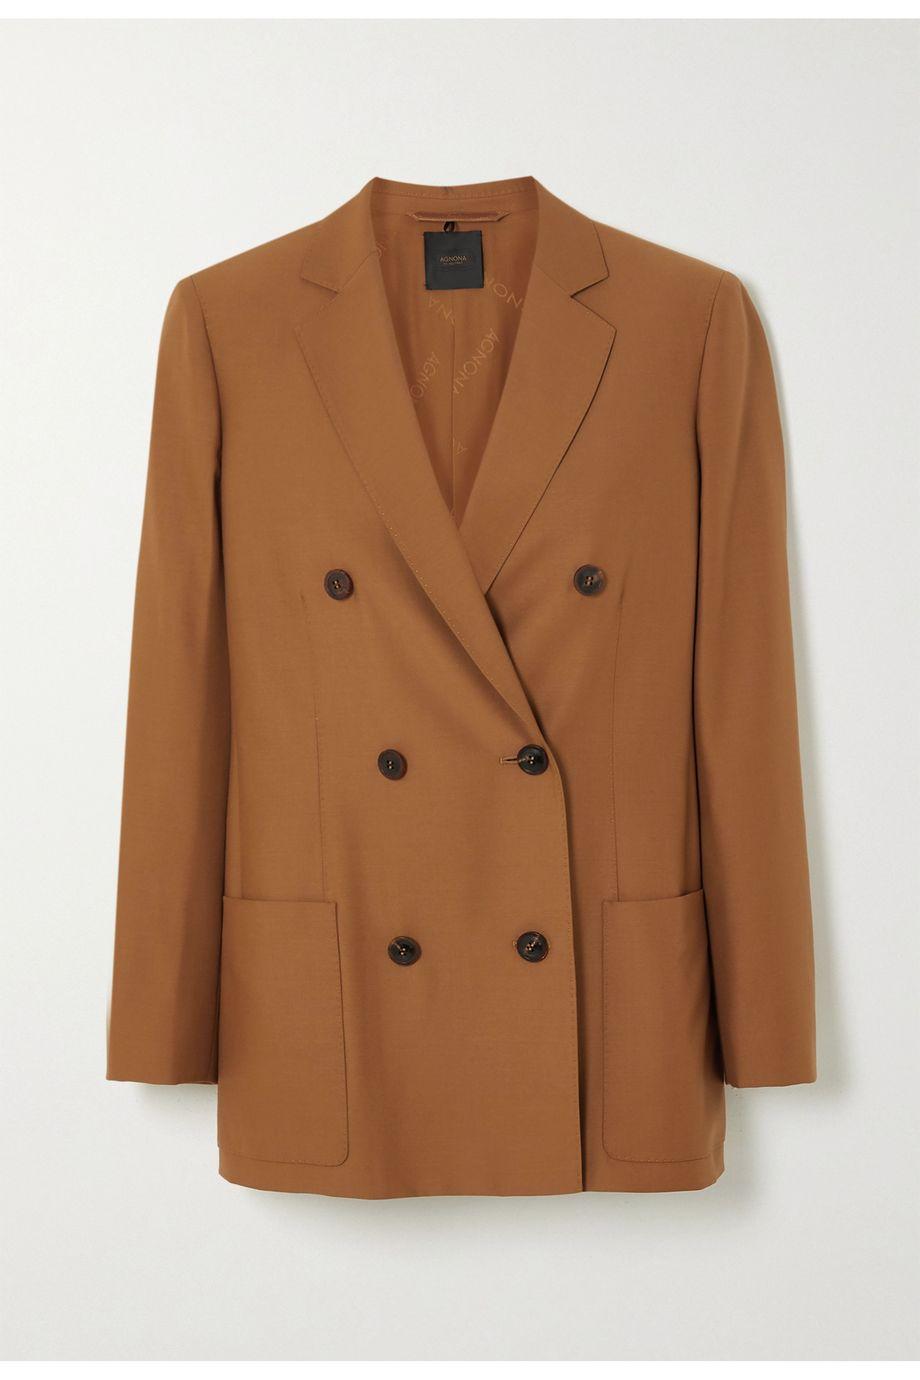 Agnona Eternals 双排扣羊毛斜纹布西装外套